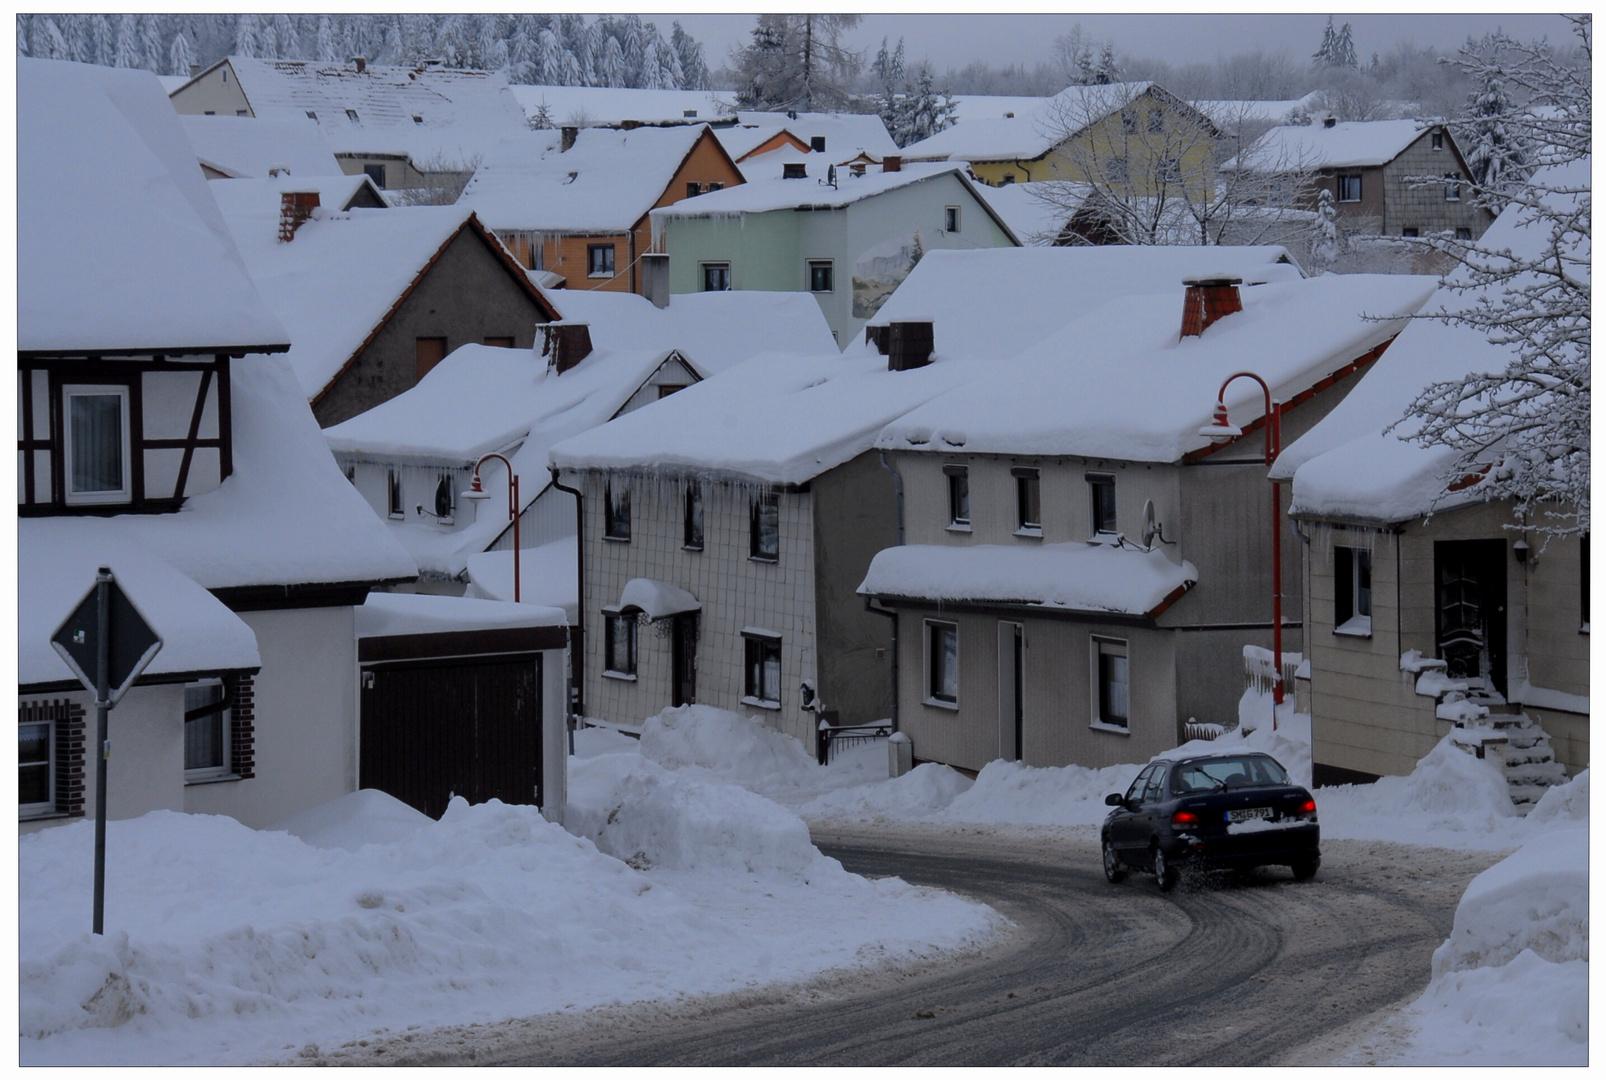 Invierno II (Winter II)